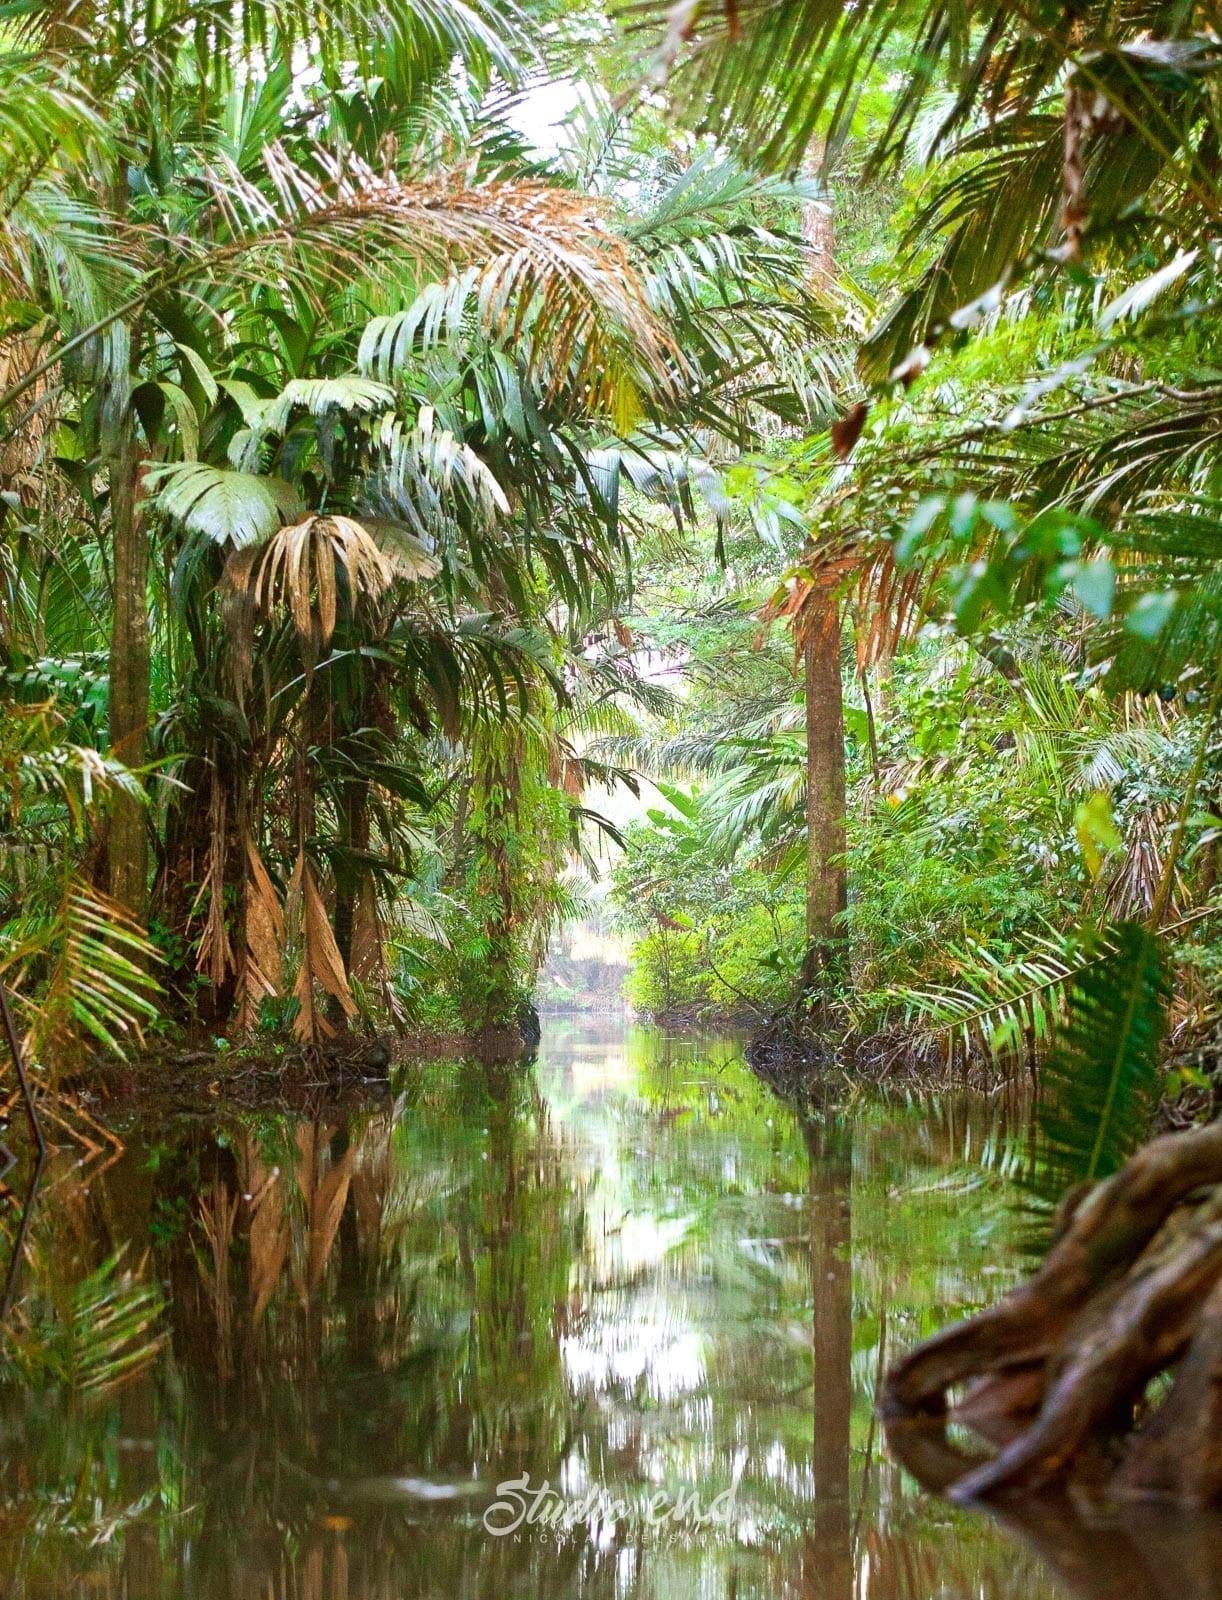 Photographe et reportage de voyage vue tropicale Costa Rica Nicolas Delsaut